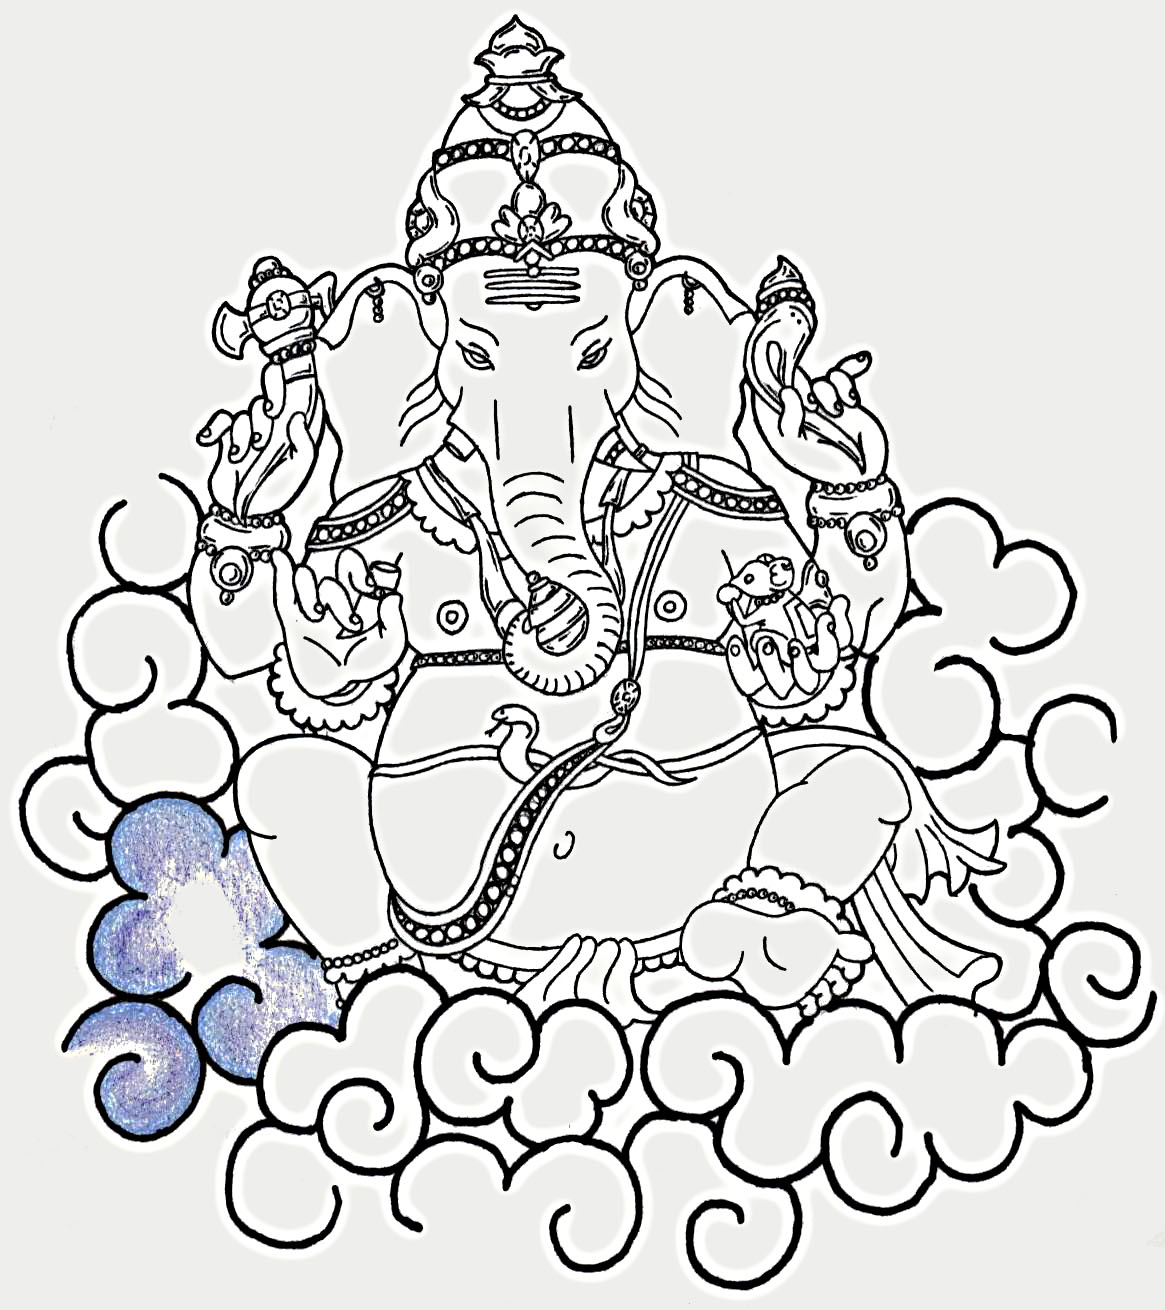 ganesh head tattoo outline - photo #23